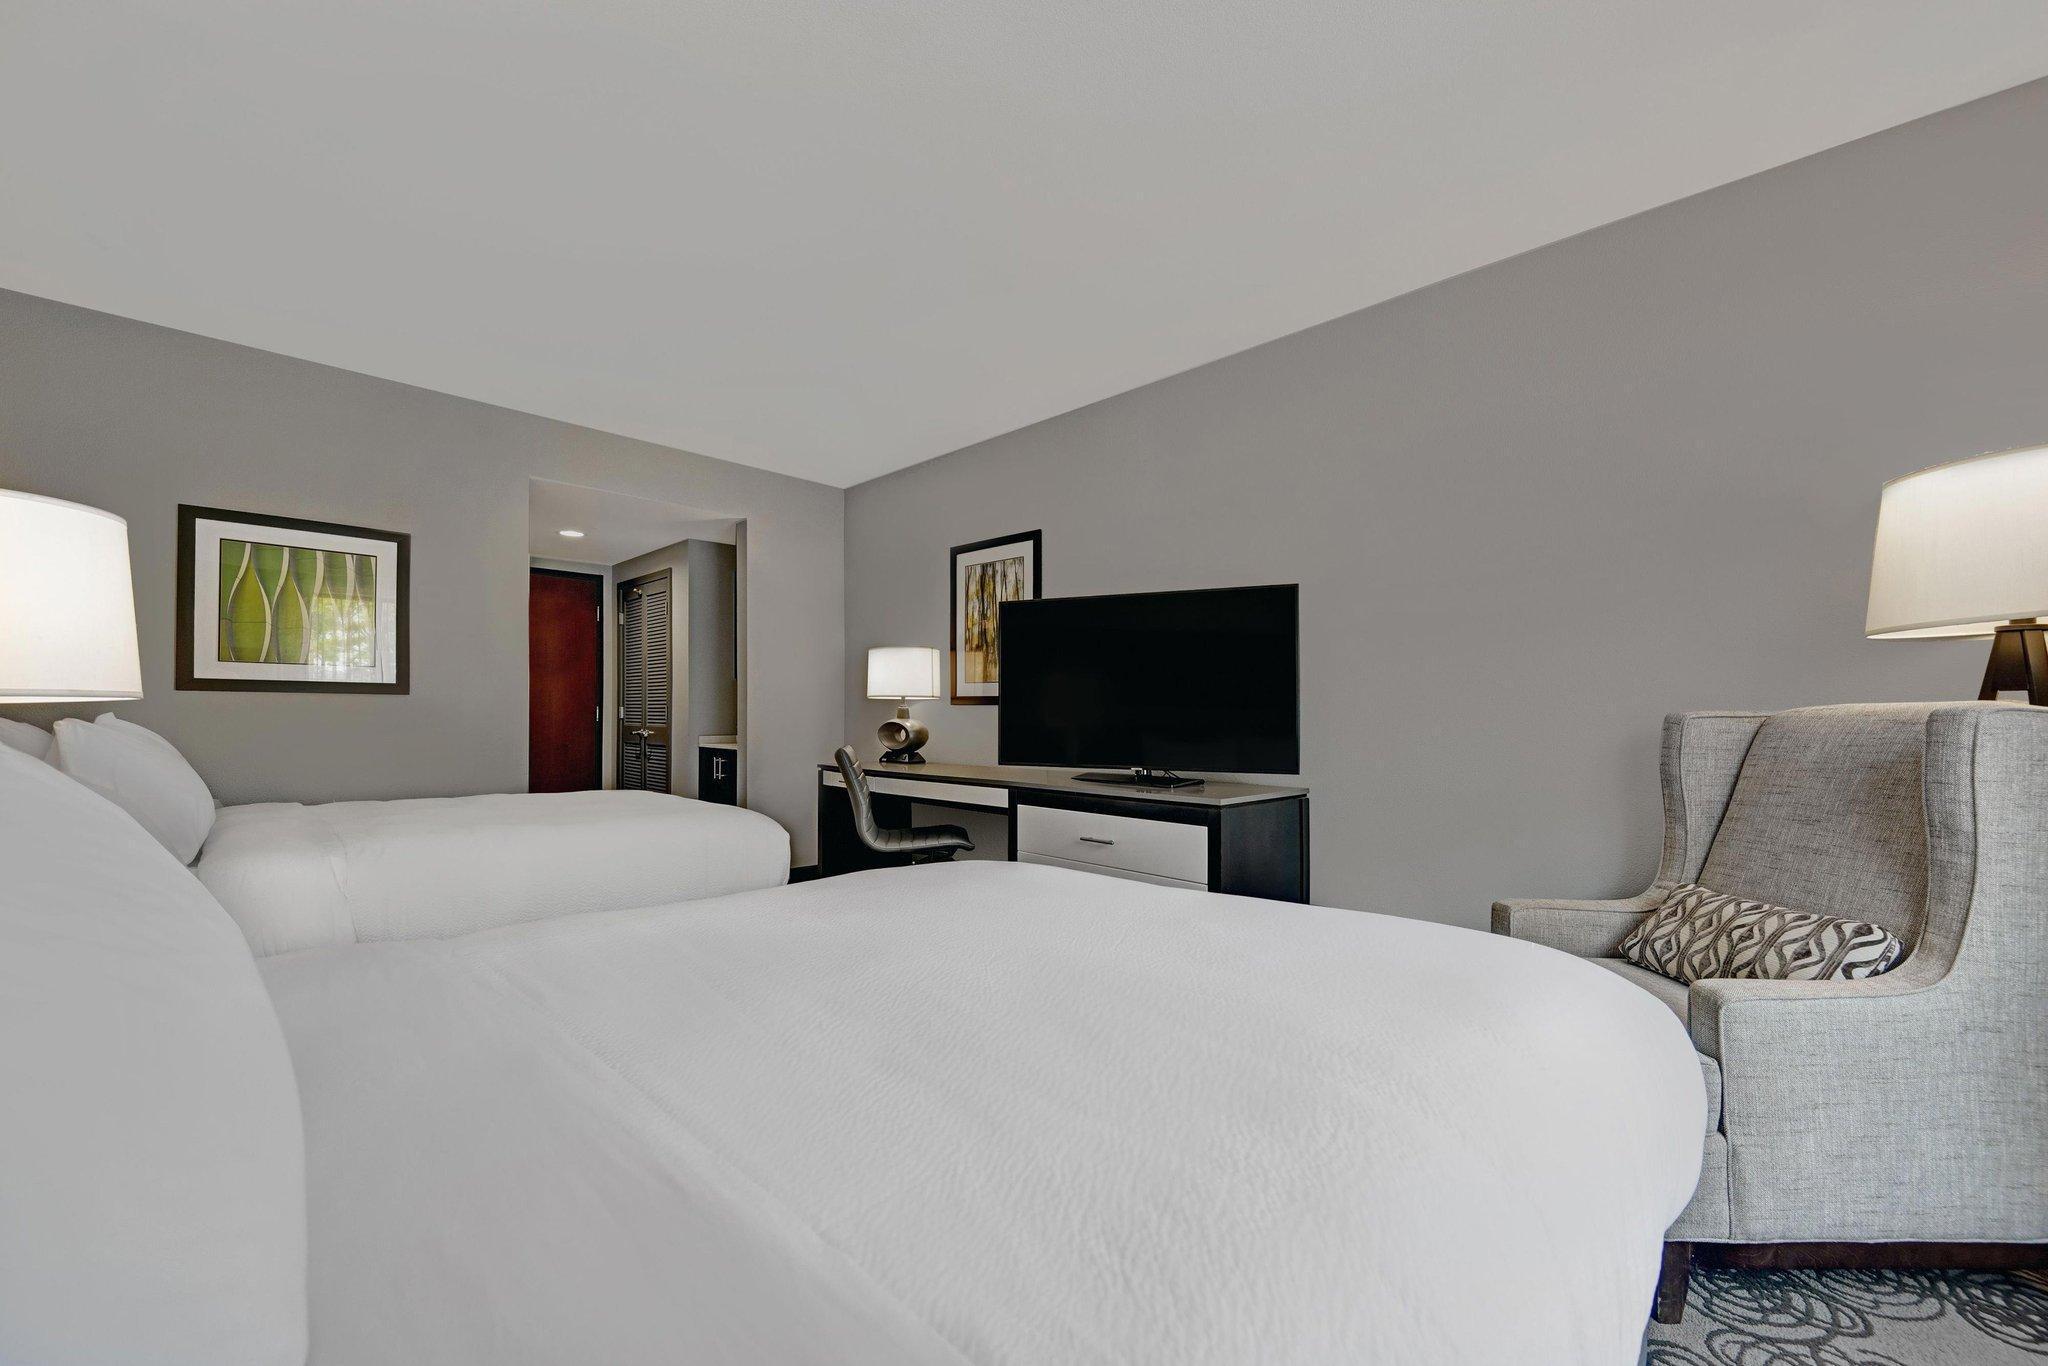 Traditional, Guest room, 2 Queen